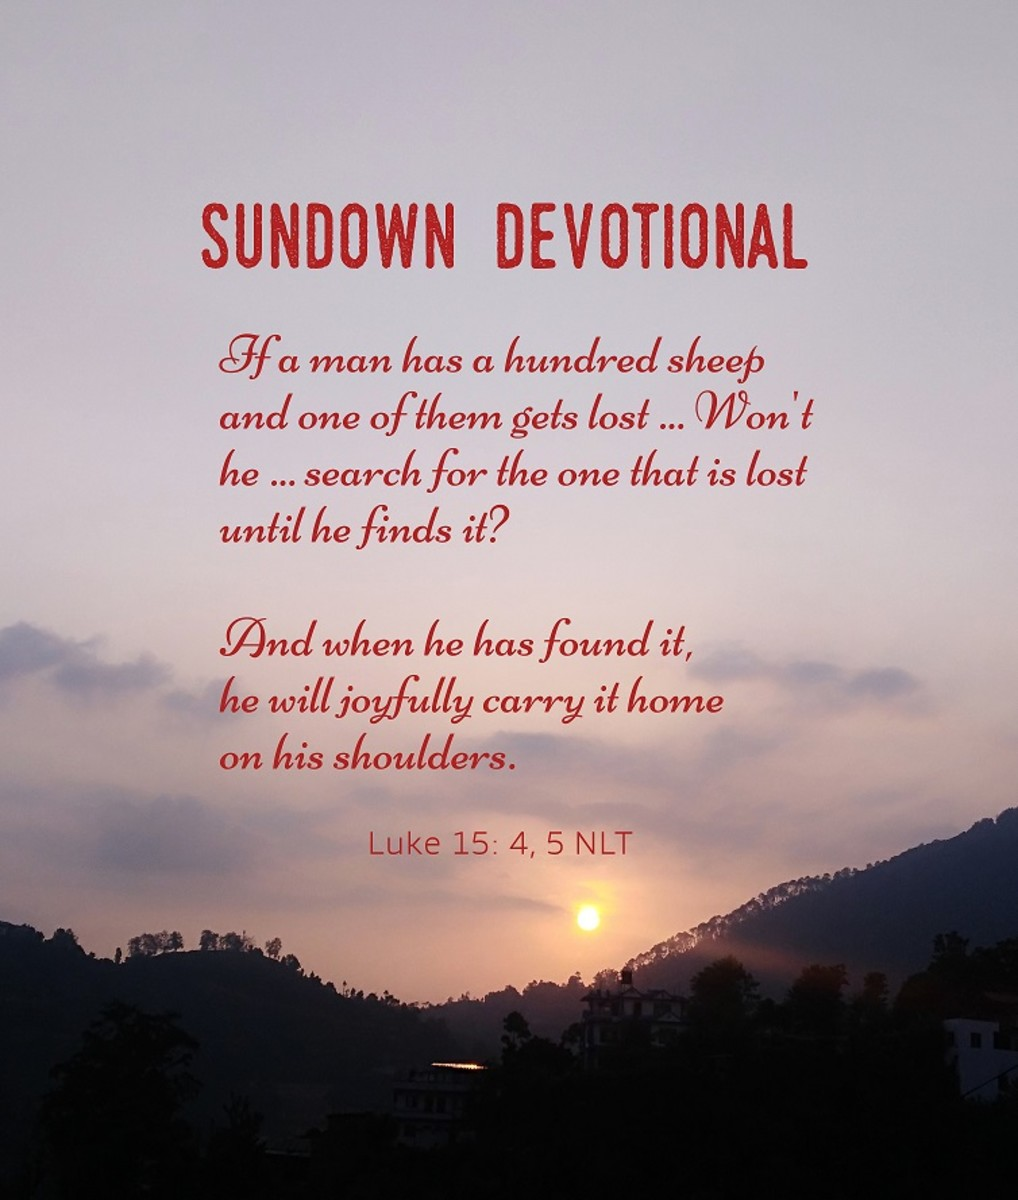 Sundown Devotional: The Sheep on God's Shoulder